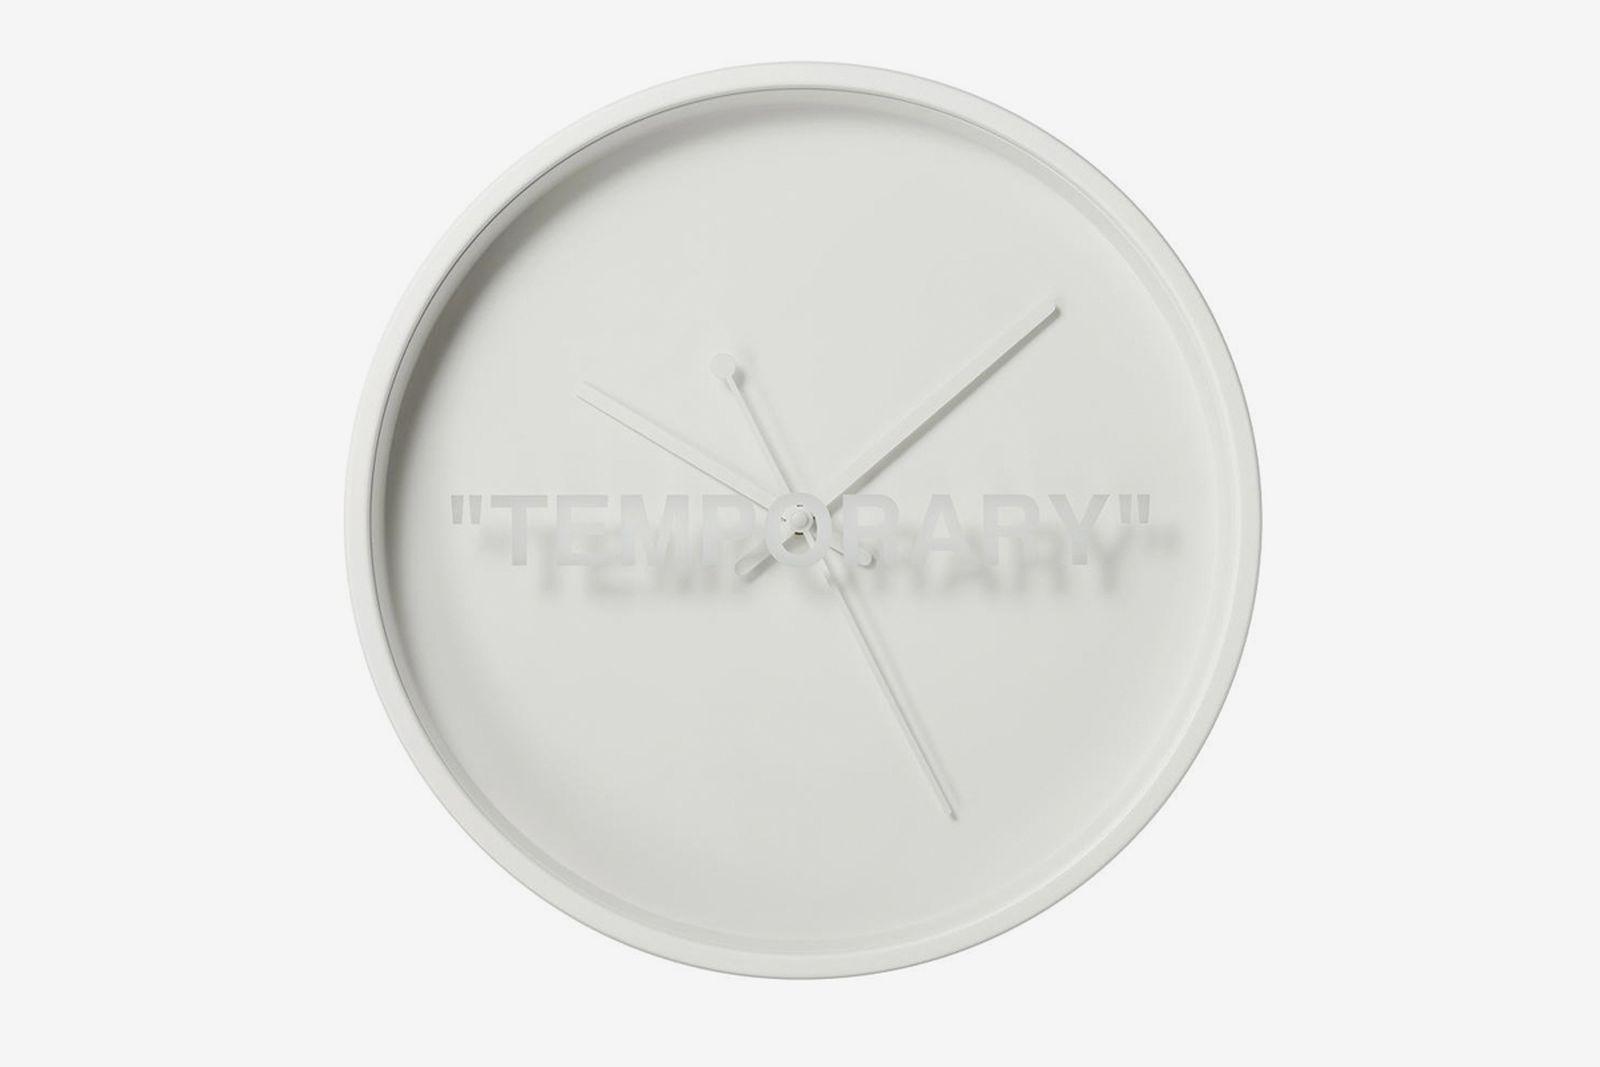 virgil-abloh-x-ikea-markerad-wall-clock-01